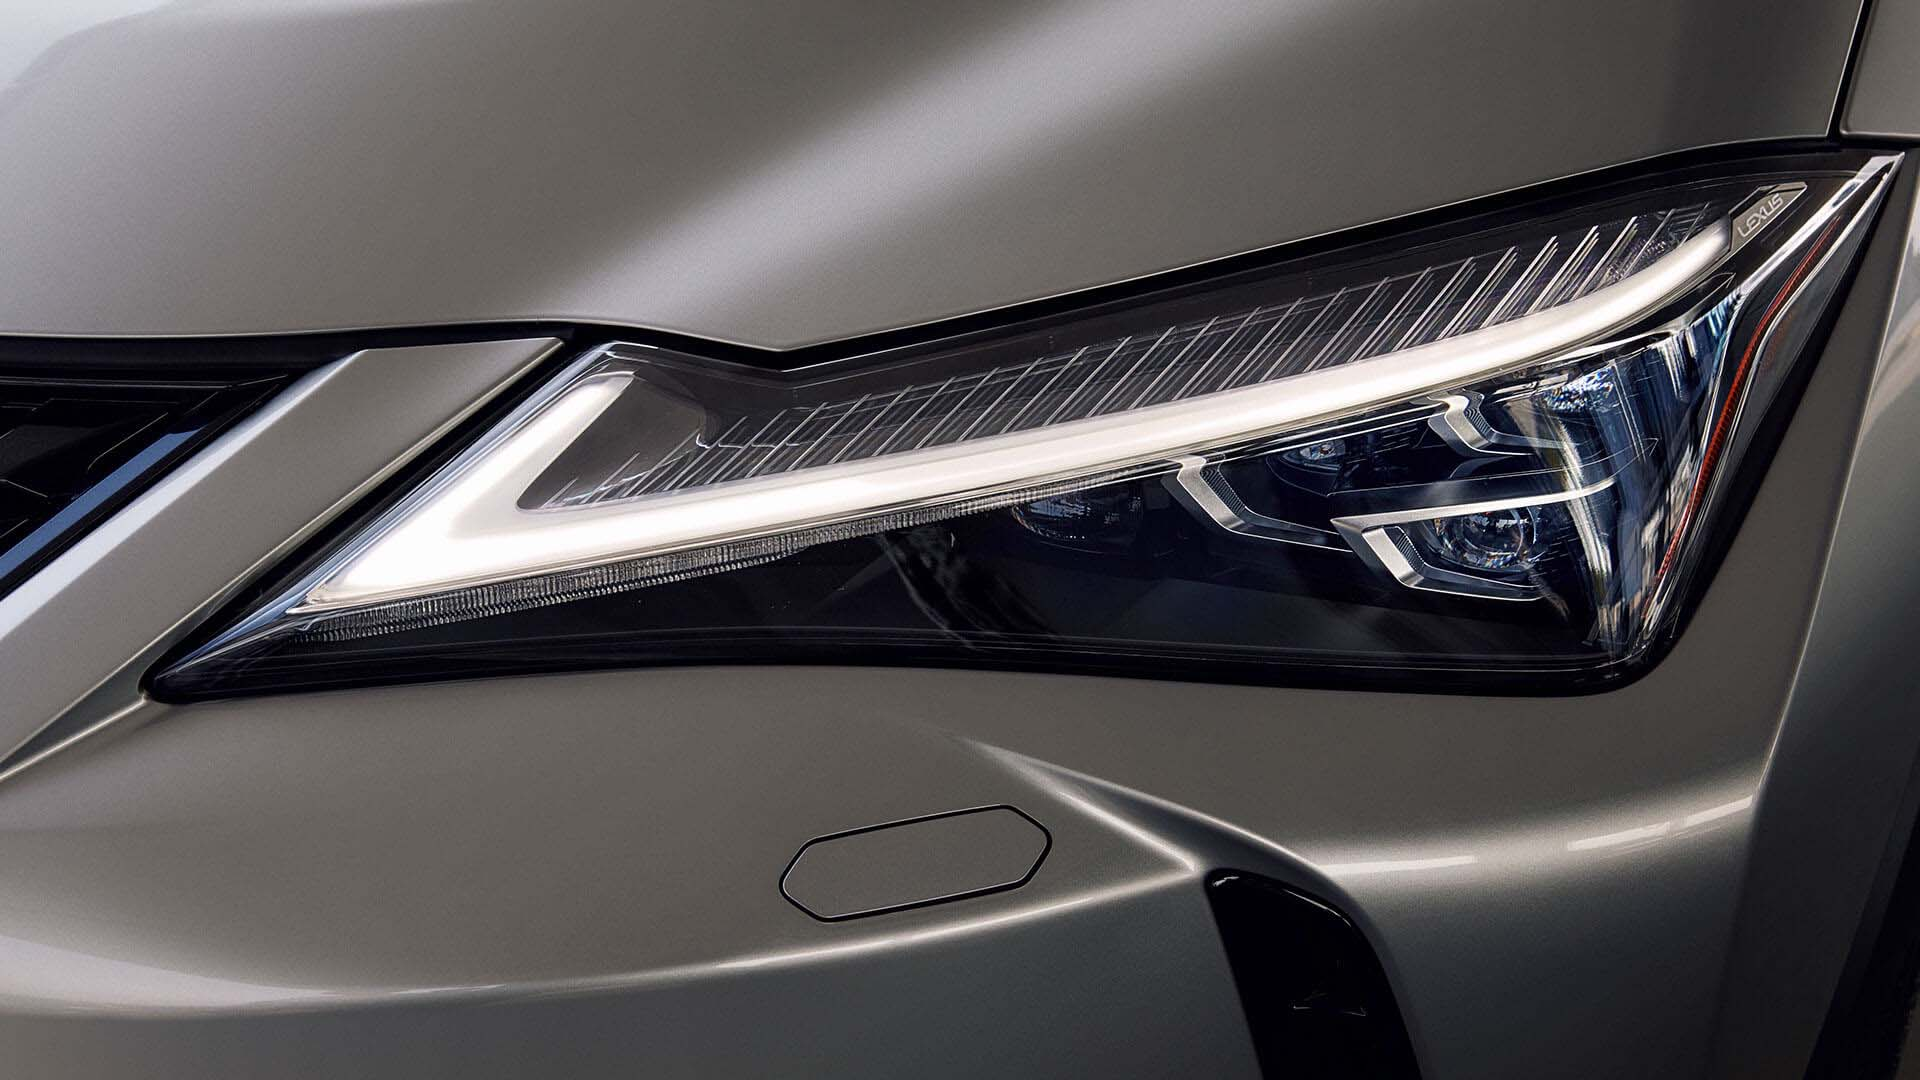 f3a6f6a094 Nuevo Lexus UX 250h | Crossover Premium | Lexus España